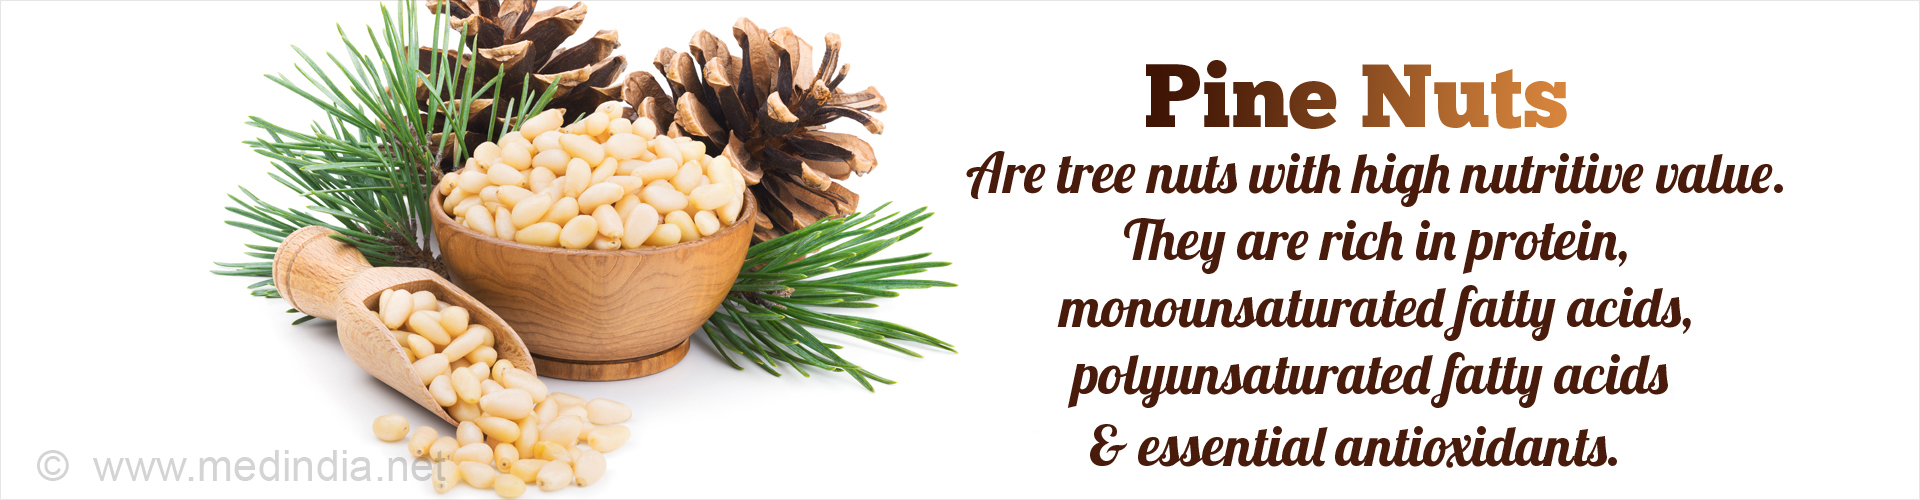 Top 6 Health Benefits of Pine Nuts